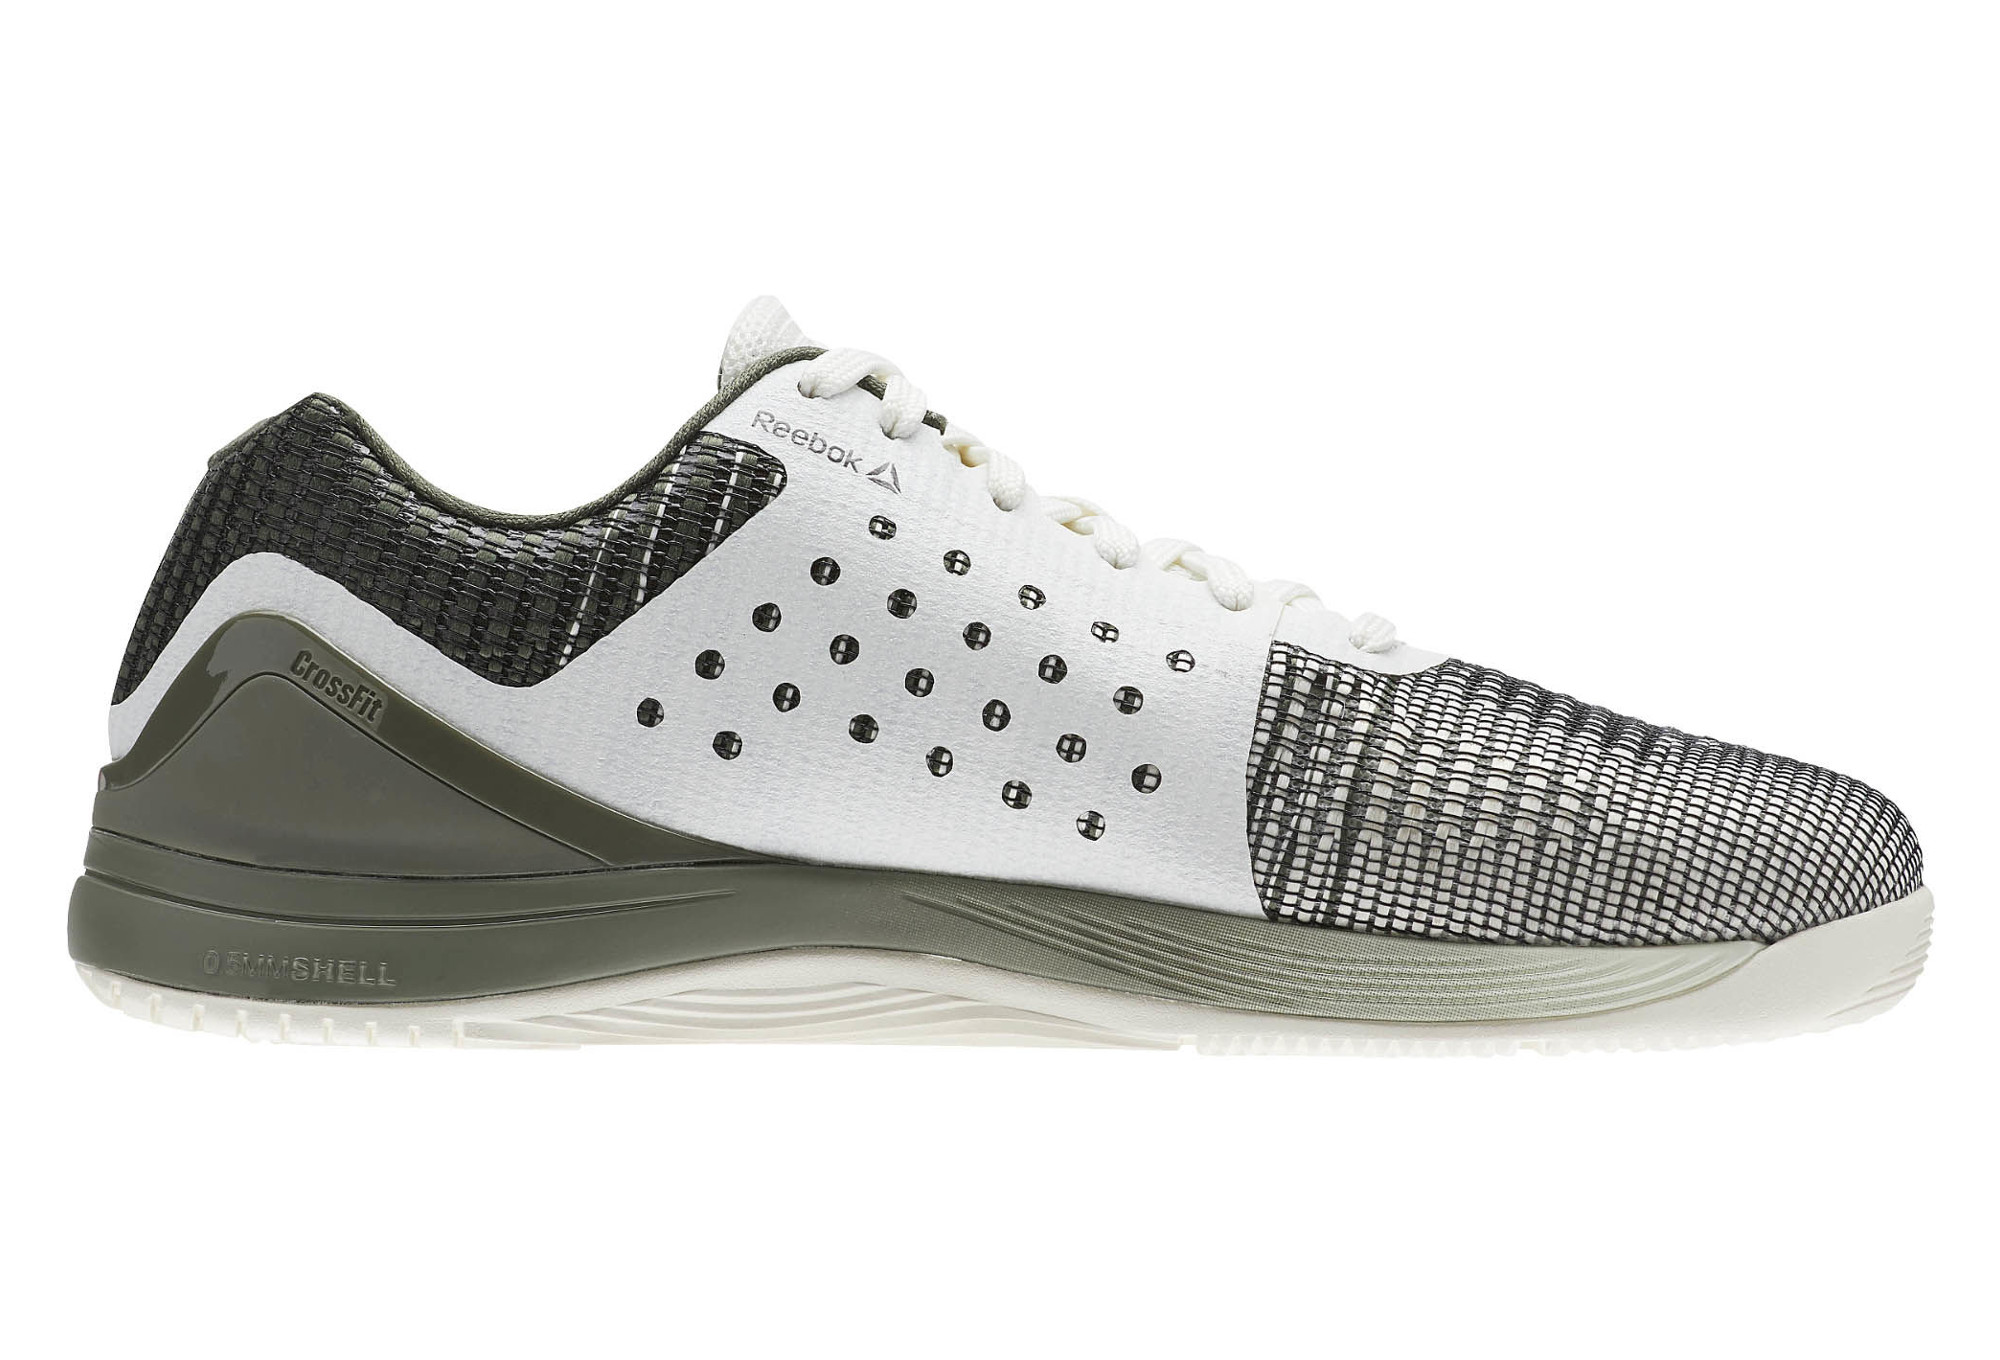 dd120a385aef7 Chaussures de Cross Training Reebok Crossfit Nano 7.0 Blanc   Noir ...